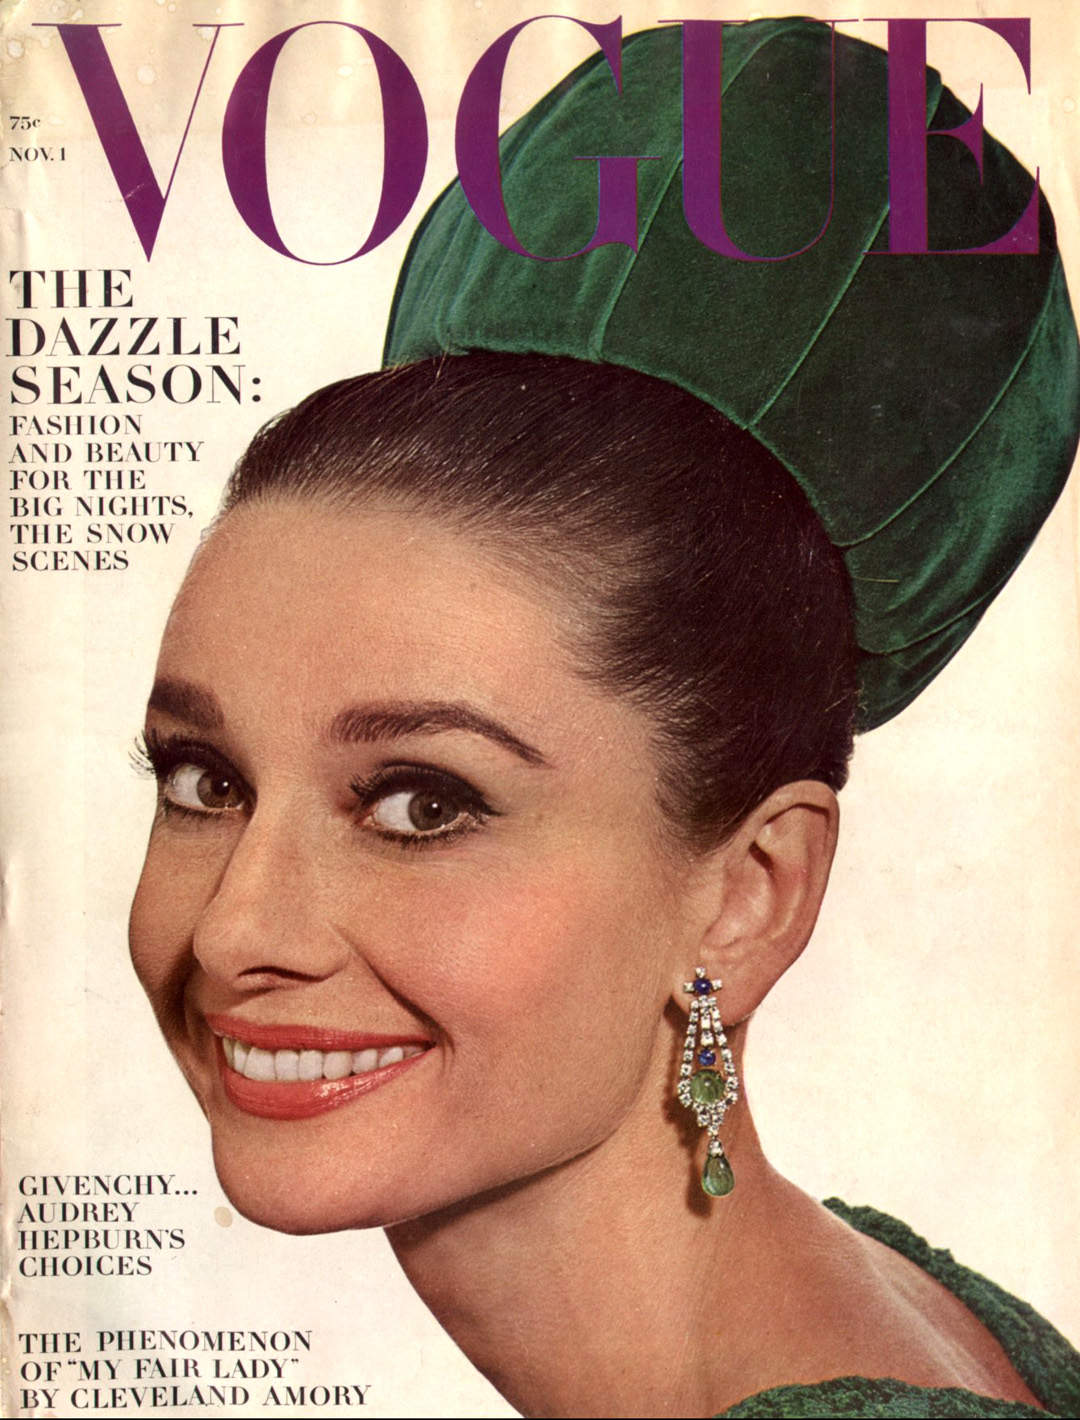 Vogue Magazine Uk May 2015 Issue: Kikiboom.com: VOGUE Covers